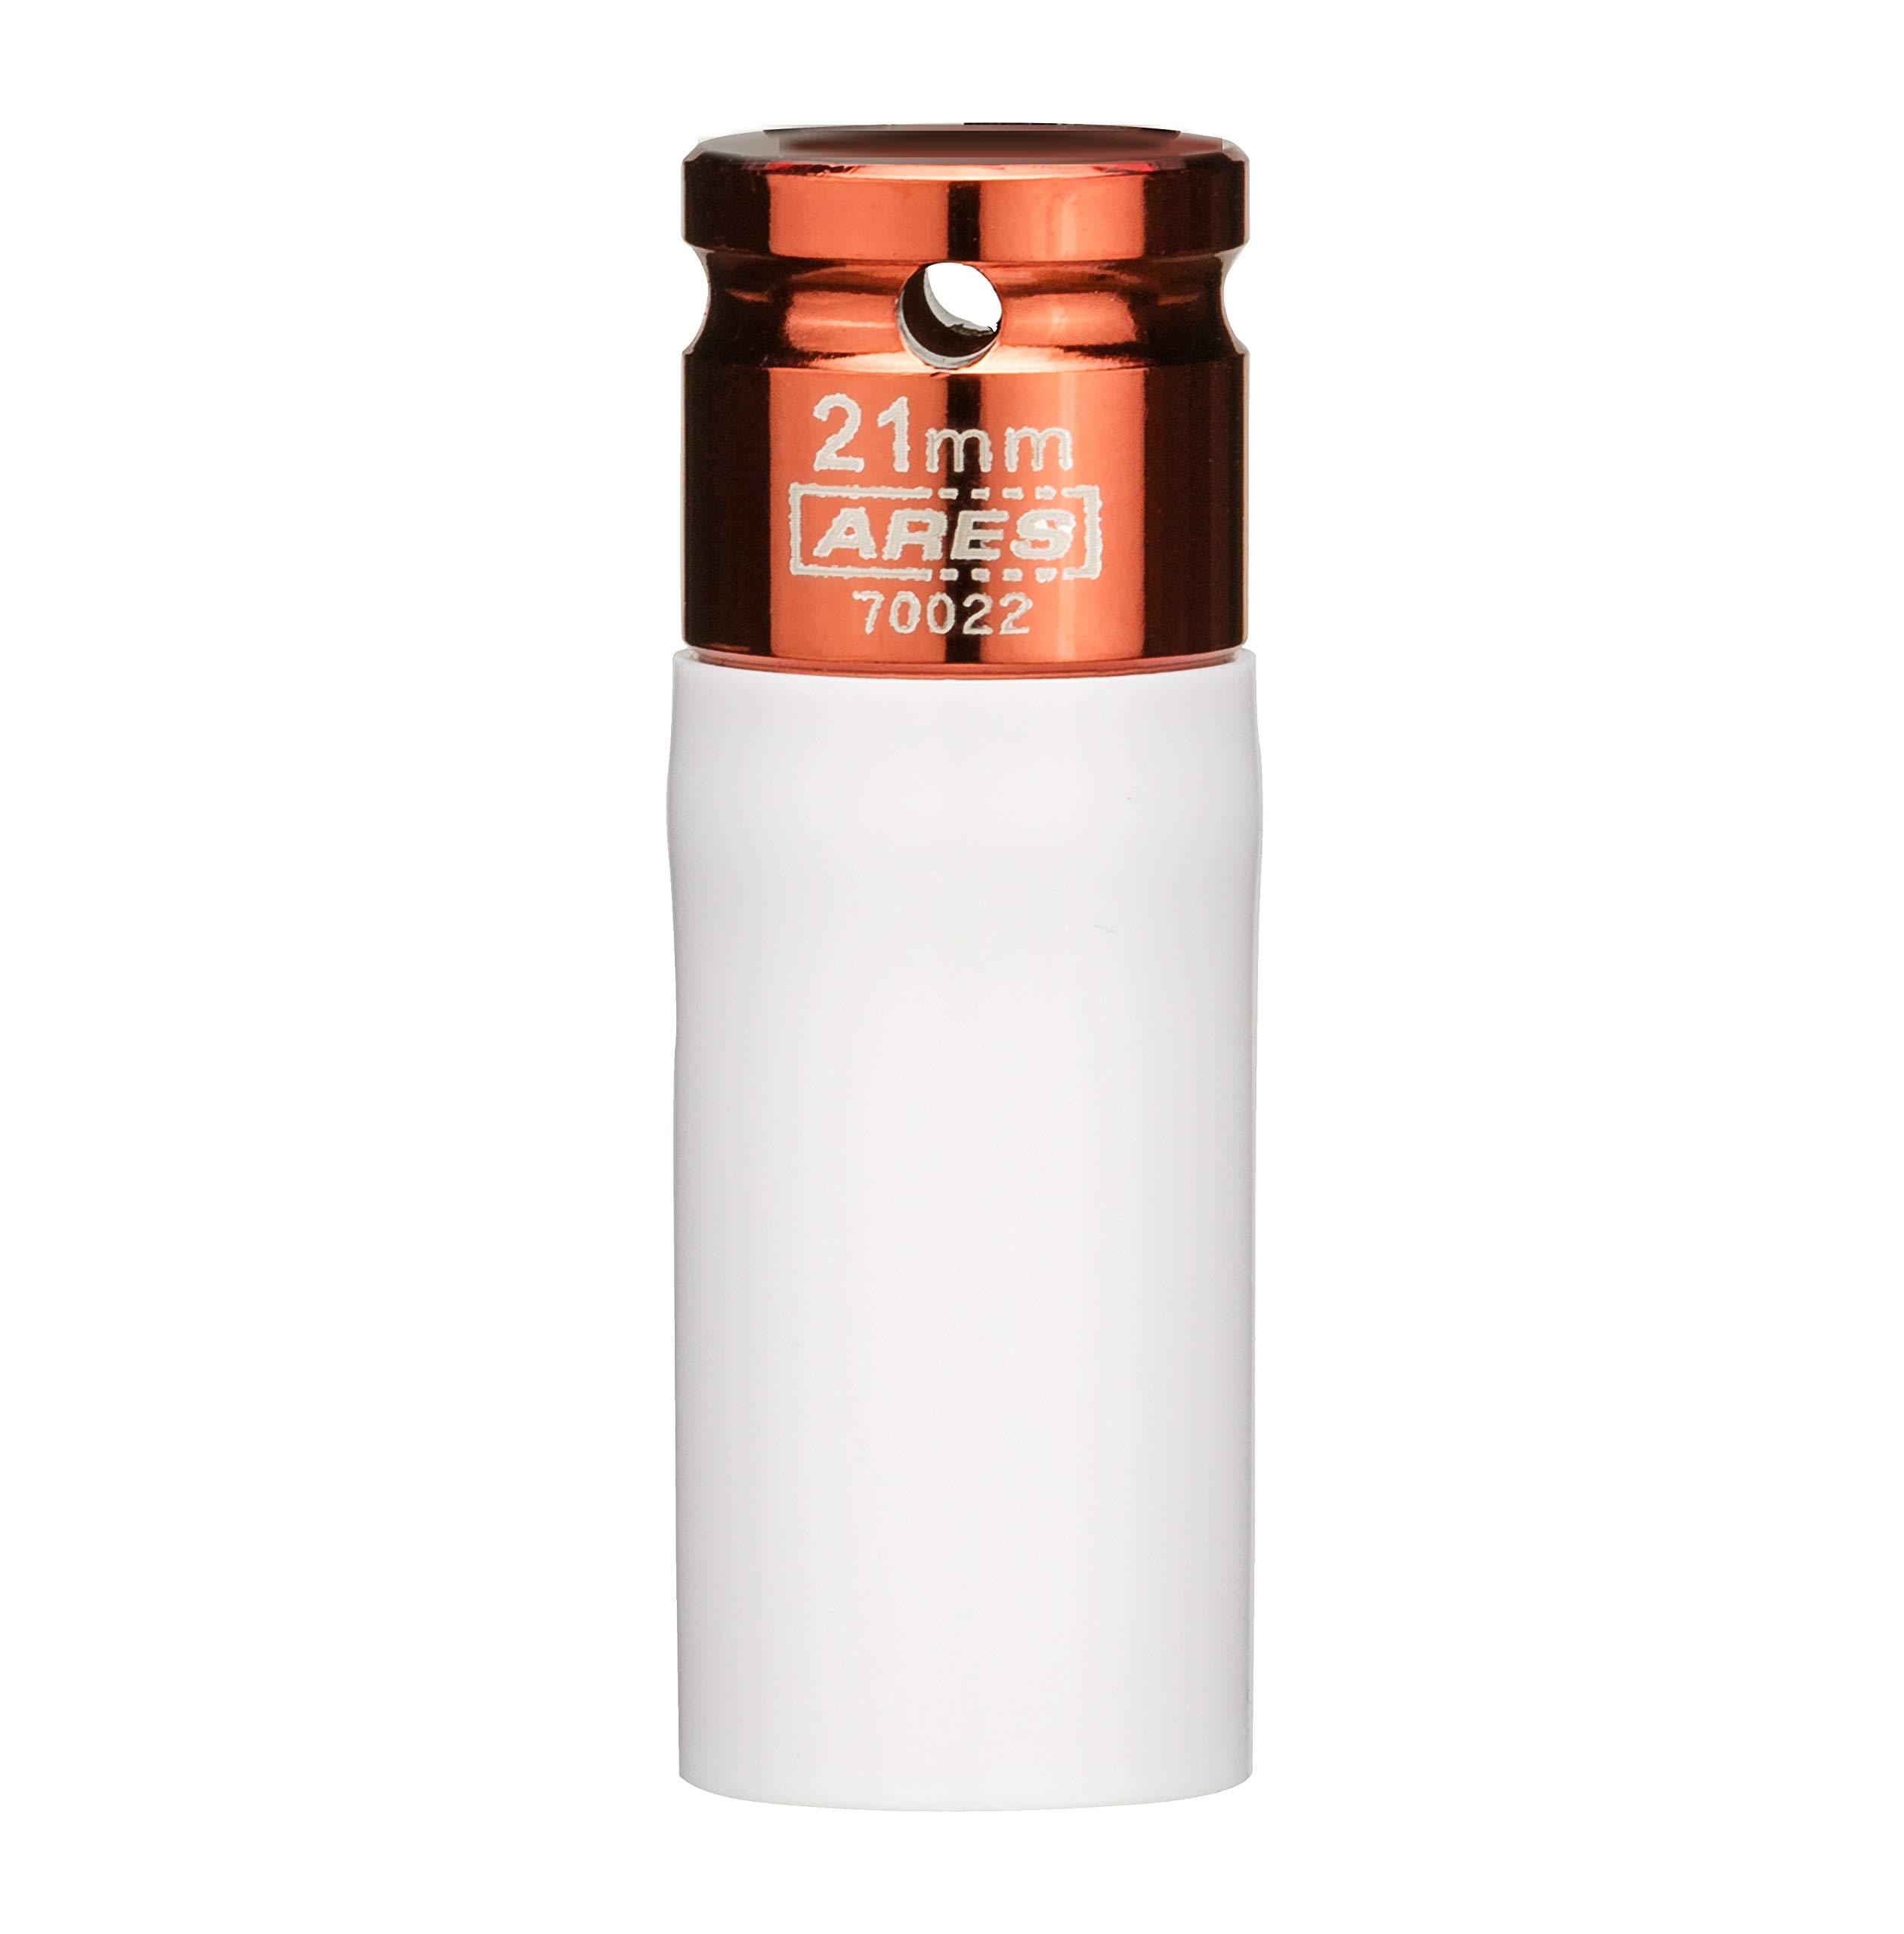 Titan 21117 XL 1//2-Inch Drive x 17mm Non-marring Impact Extra-Long Lug Nut Socket